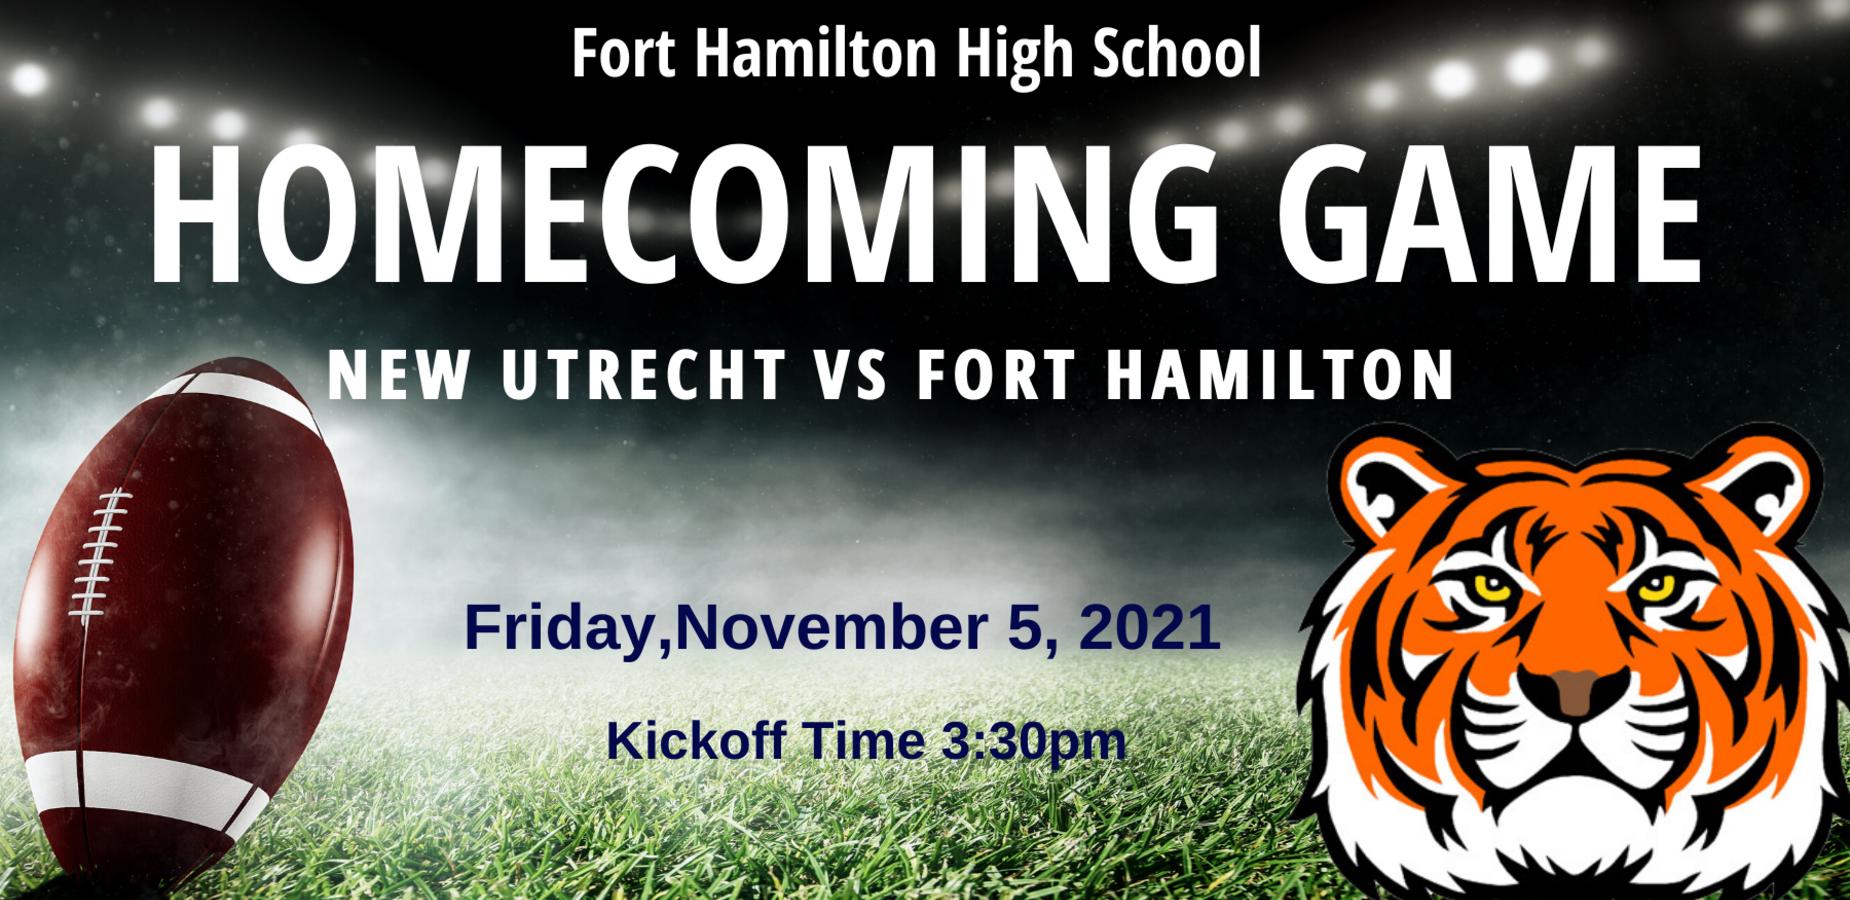 Fort Hamilton High School Homecoming Game. New Utrecht vs Fort Hamilton, Friday,November 5, 2021. Kickoff Time 3:30PM